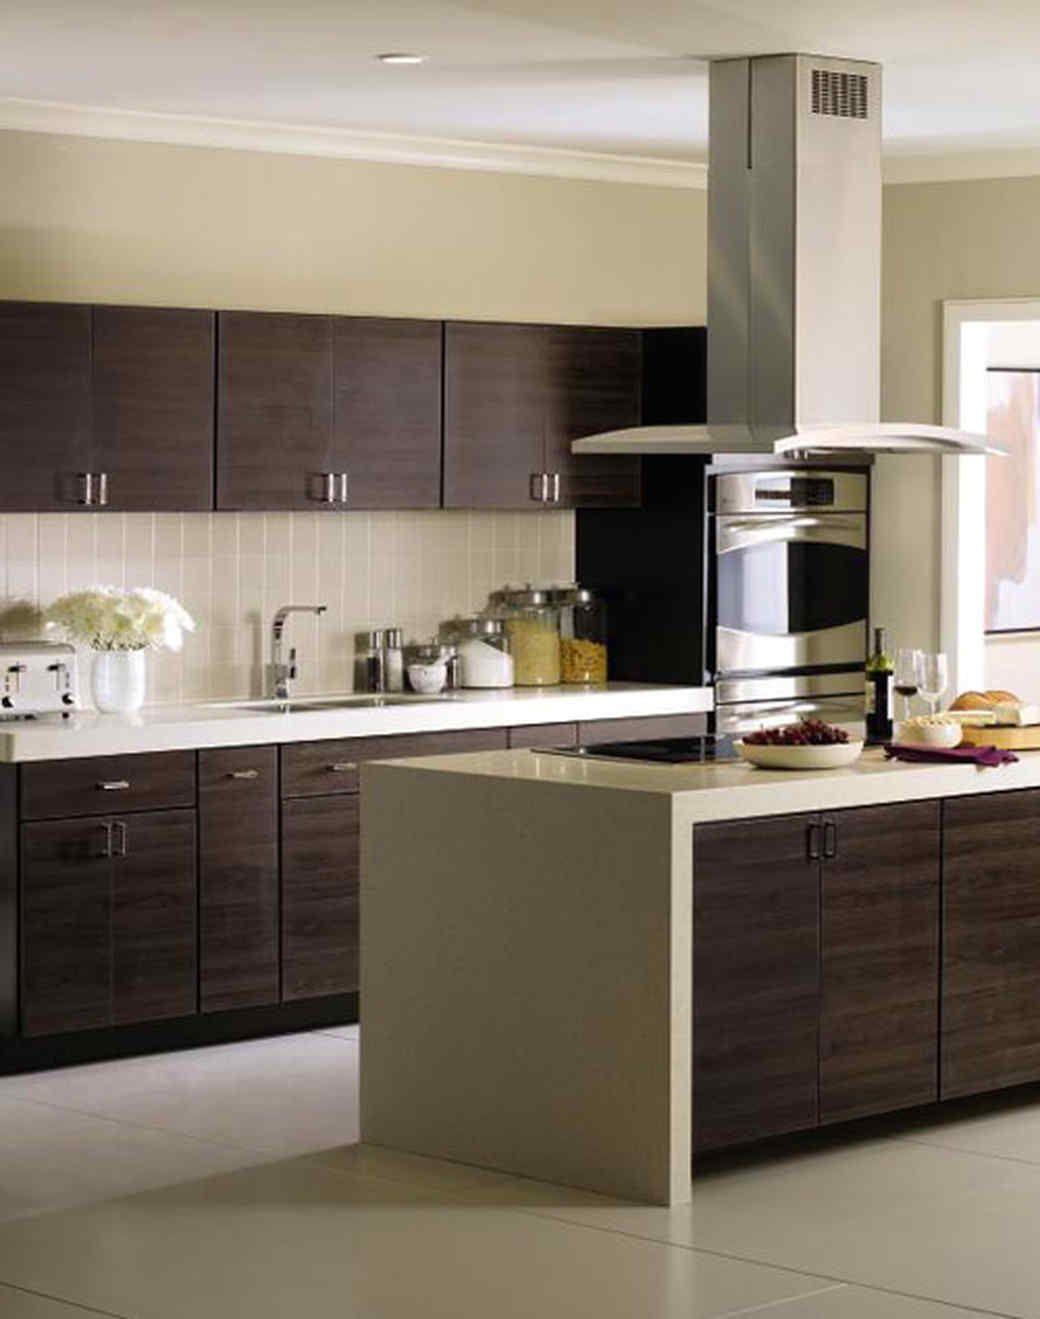 Martha Stewart Living Kitchen Designs From The Home Depot Martha Stewart Living In 2020 Martha Stewart Living Kitchen Cost Of Kitchen Cabinets Kitchen Cabinet Styles